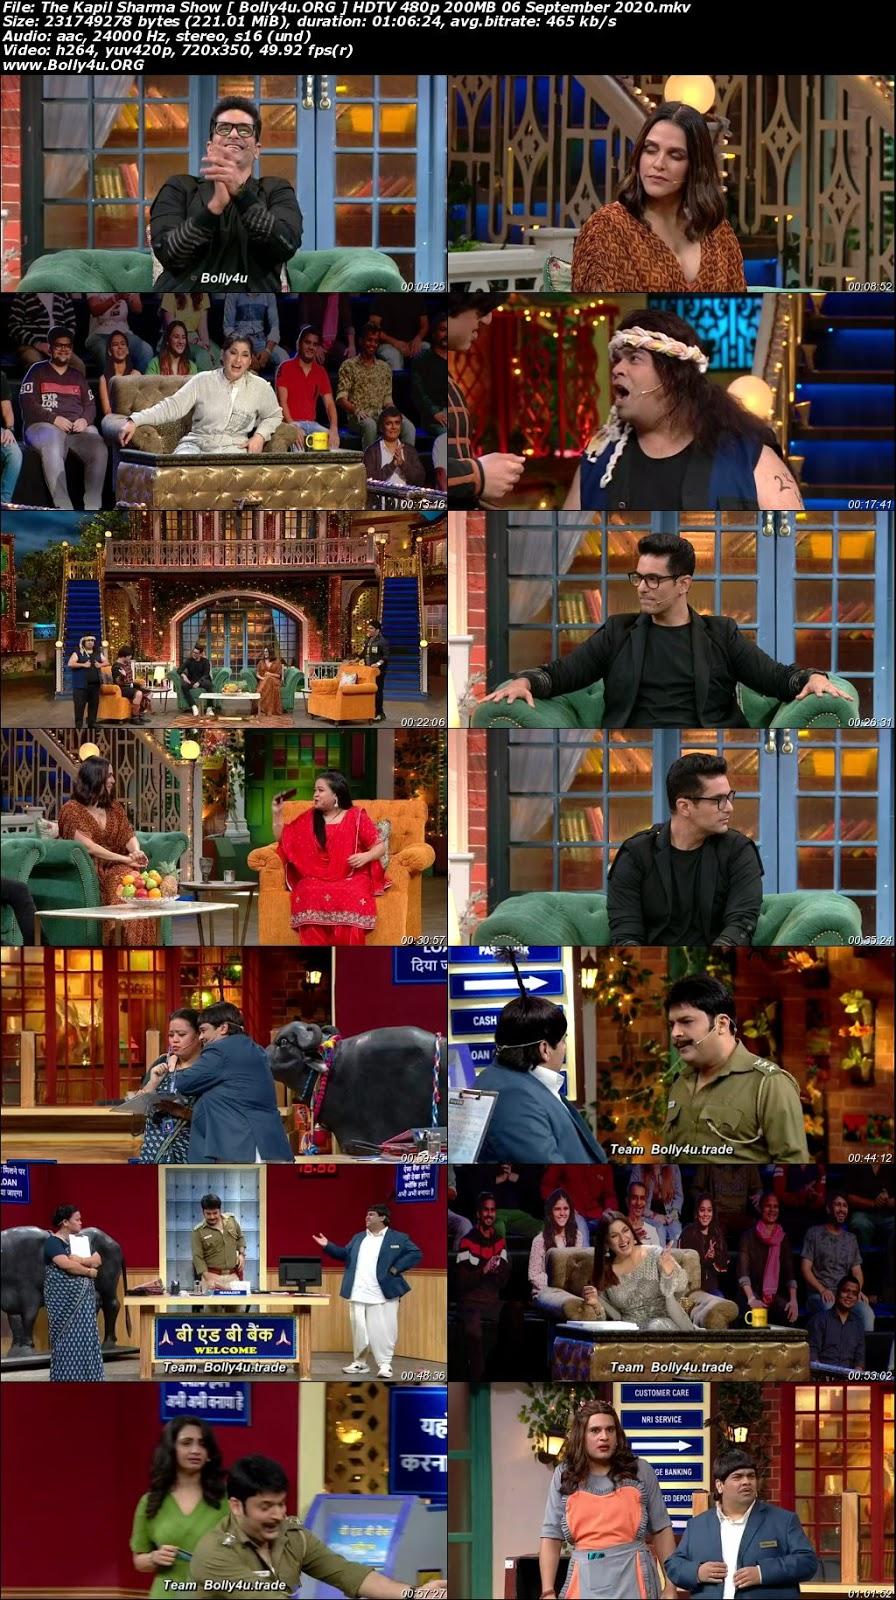 The Kapil Sharma Show HDTV 480p 200MB 06 September 2020 Download